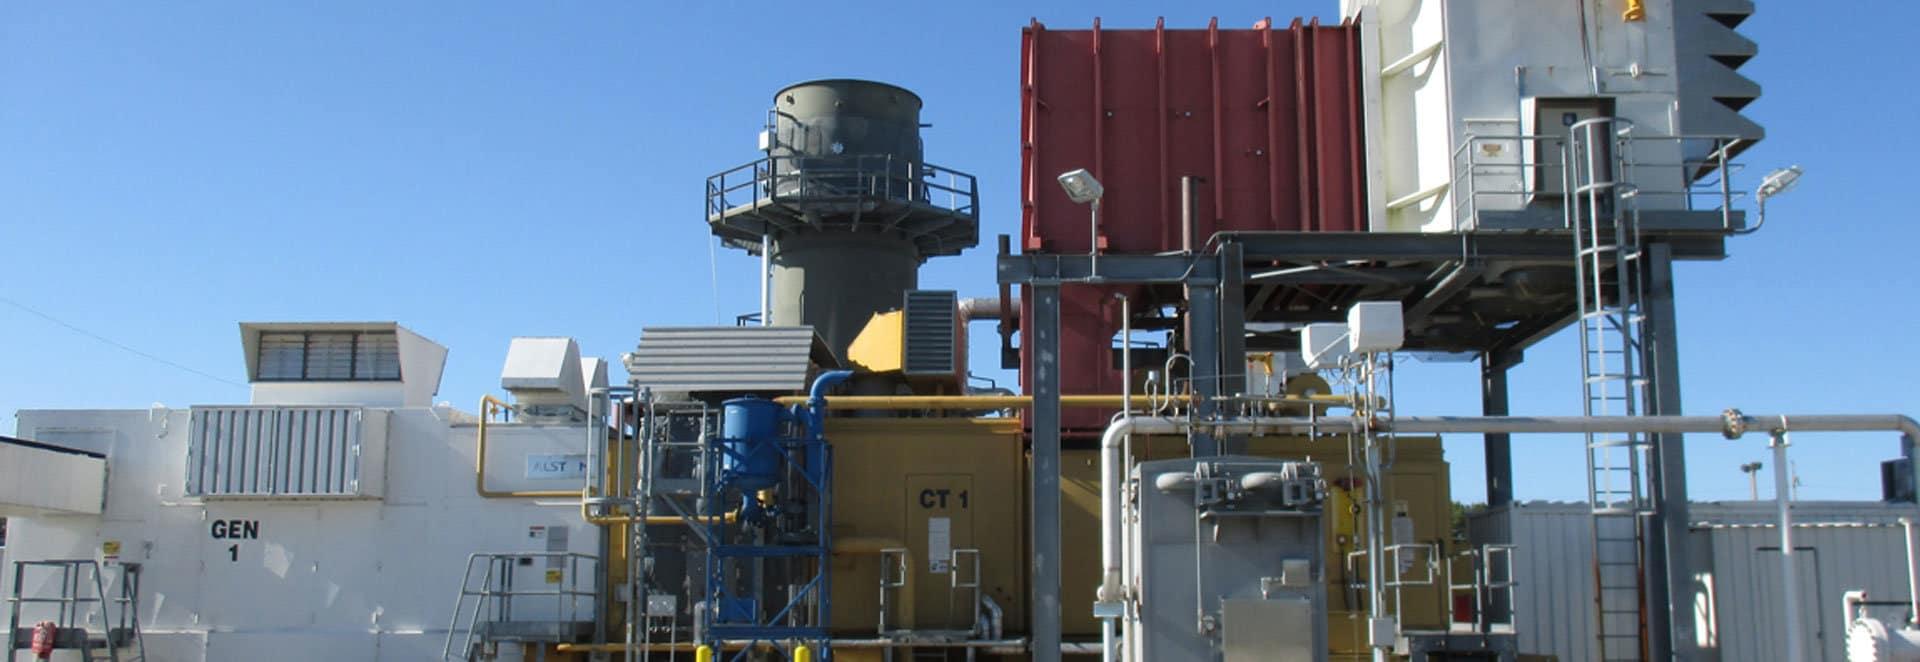 Petrotech Market - Power Generation